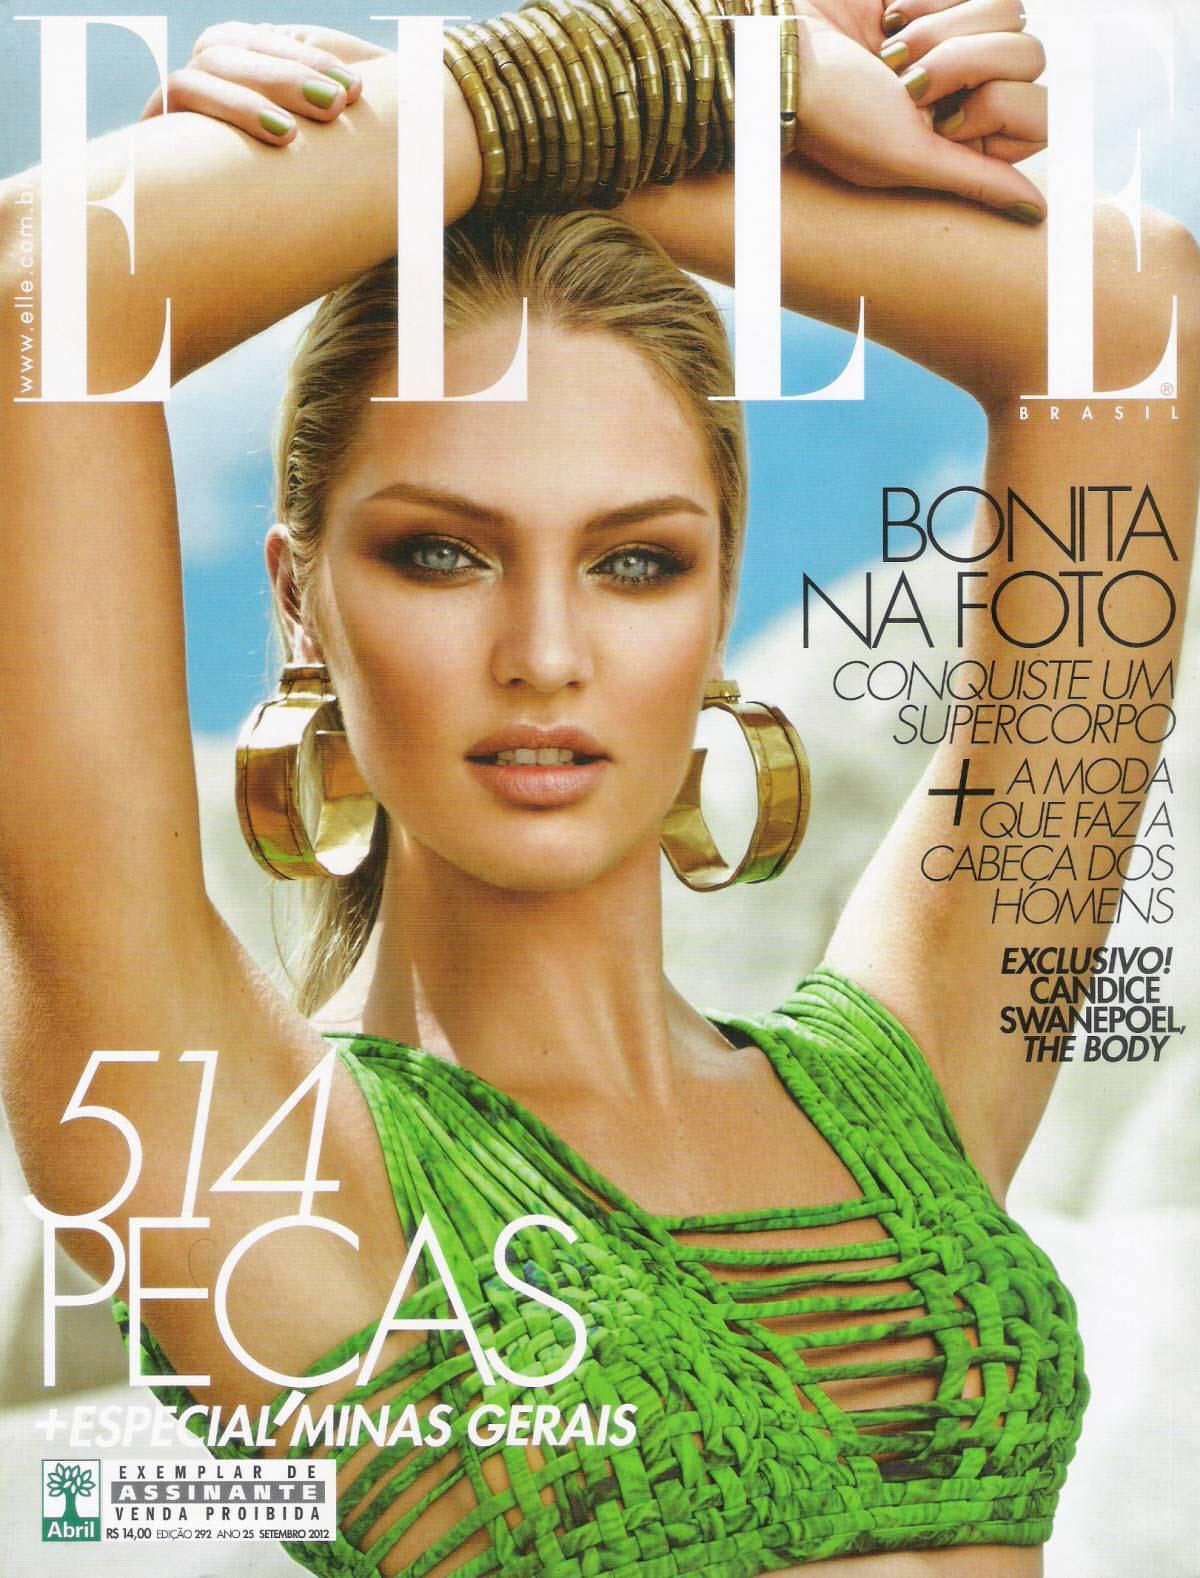 http://4.bp.blogspot.com/-8O4CzzuAOCs/UFOX279LLeI/AAAAAAAAeps/bf-A5S11UsE/s1600/Candice+Swanepoel+-+Elle+Brazil+September+2012+1.jpg